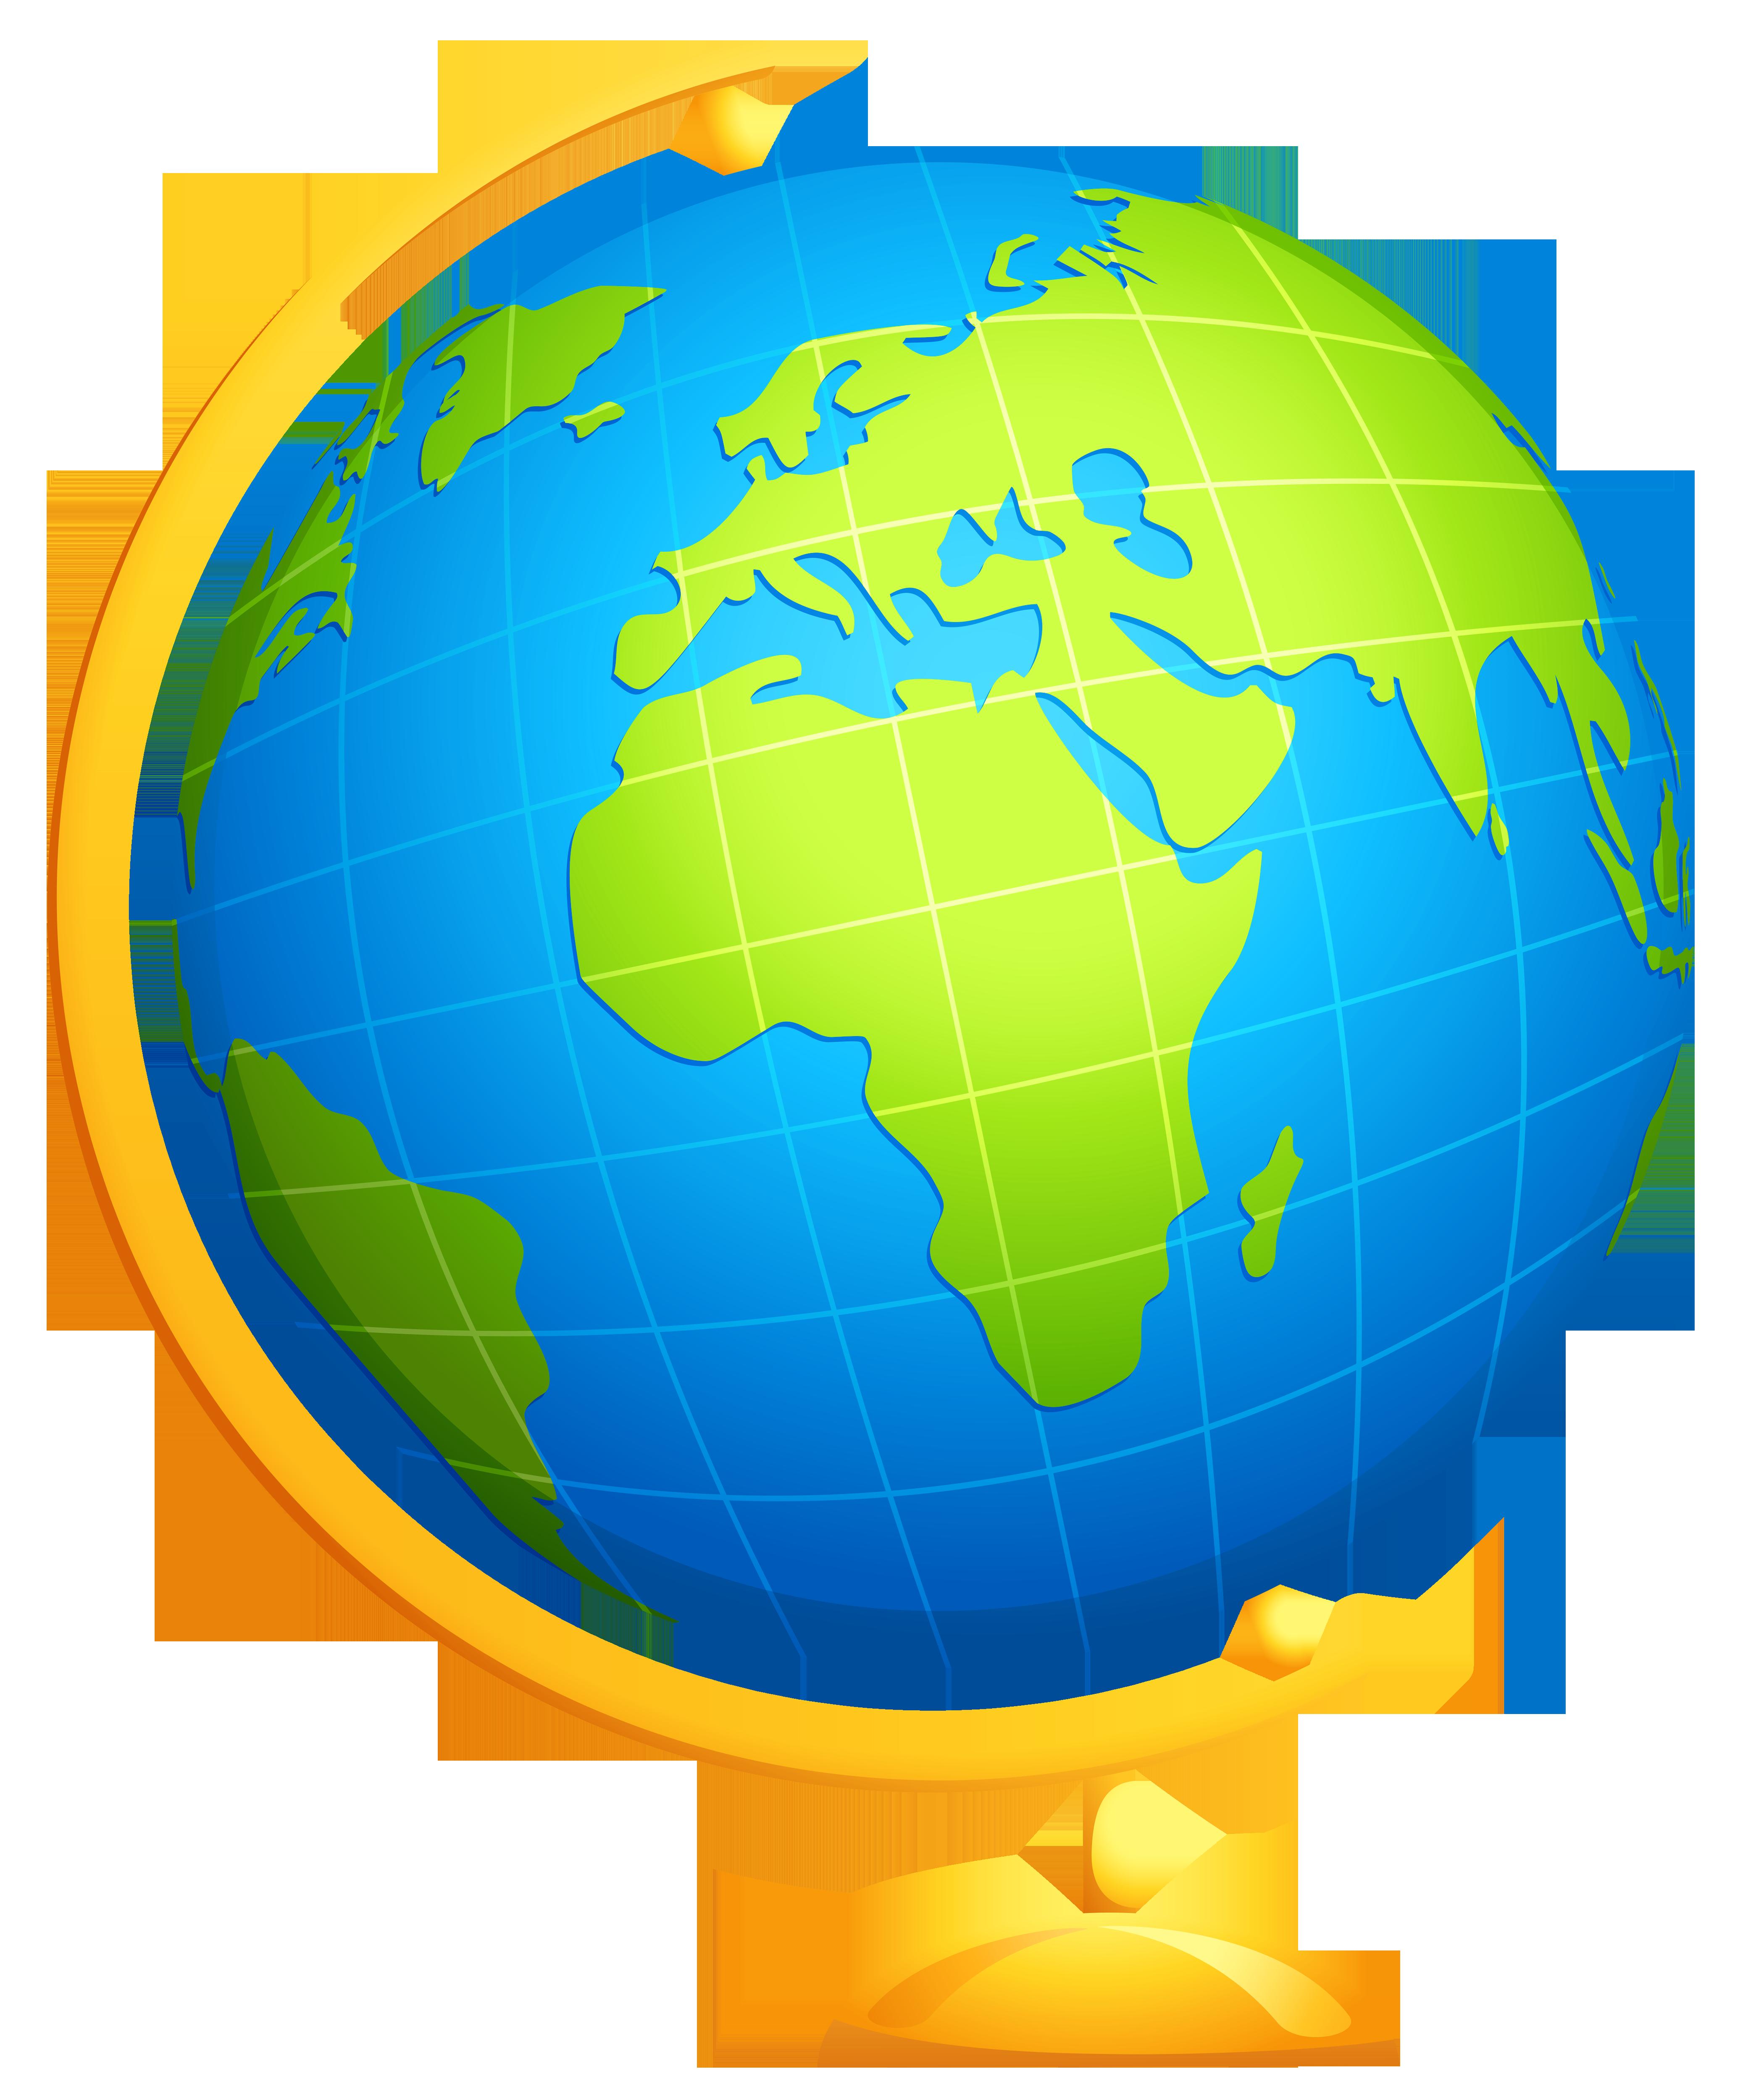 Globe clipart gambar, Globe gambar Transparent FREE for.